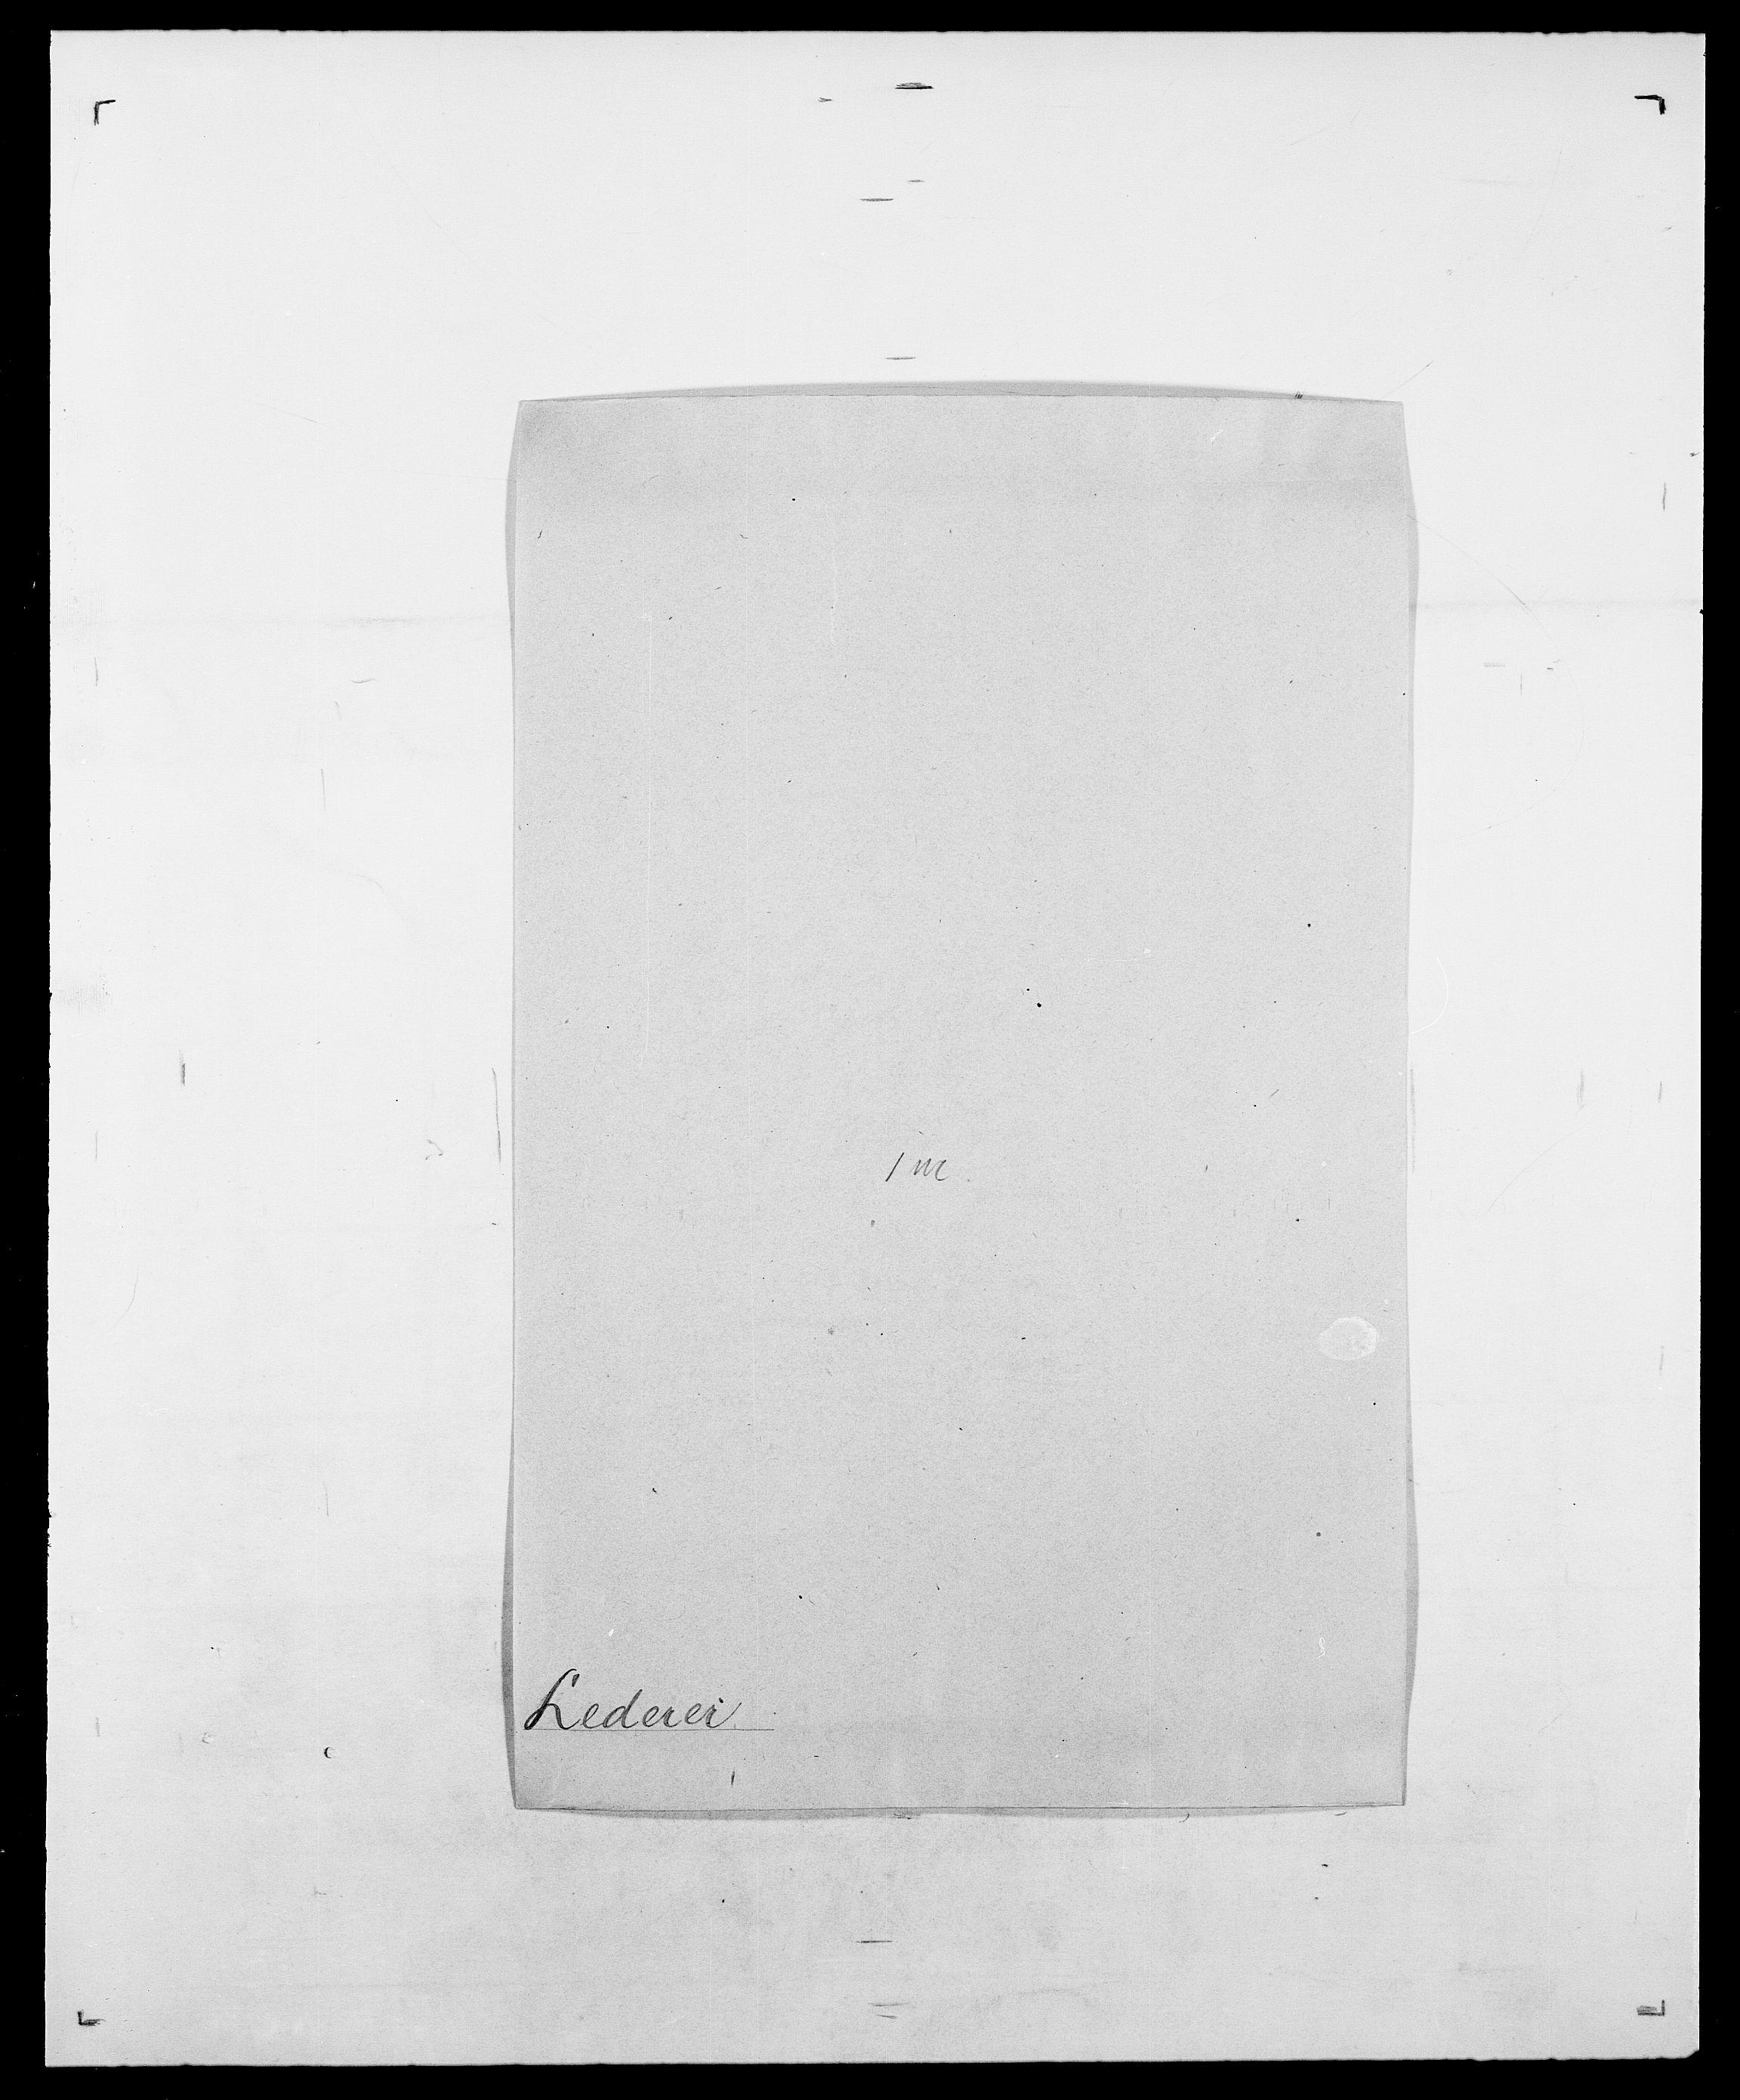 SAO, Delgobe, Charles Antoine - samling, D/Da/L0023: Lau - Lirvyn, s. 60